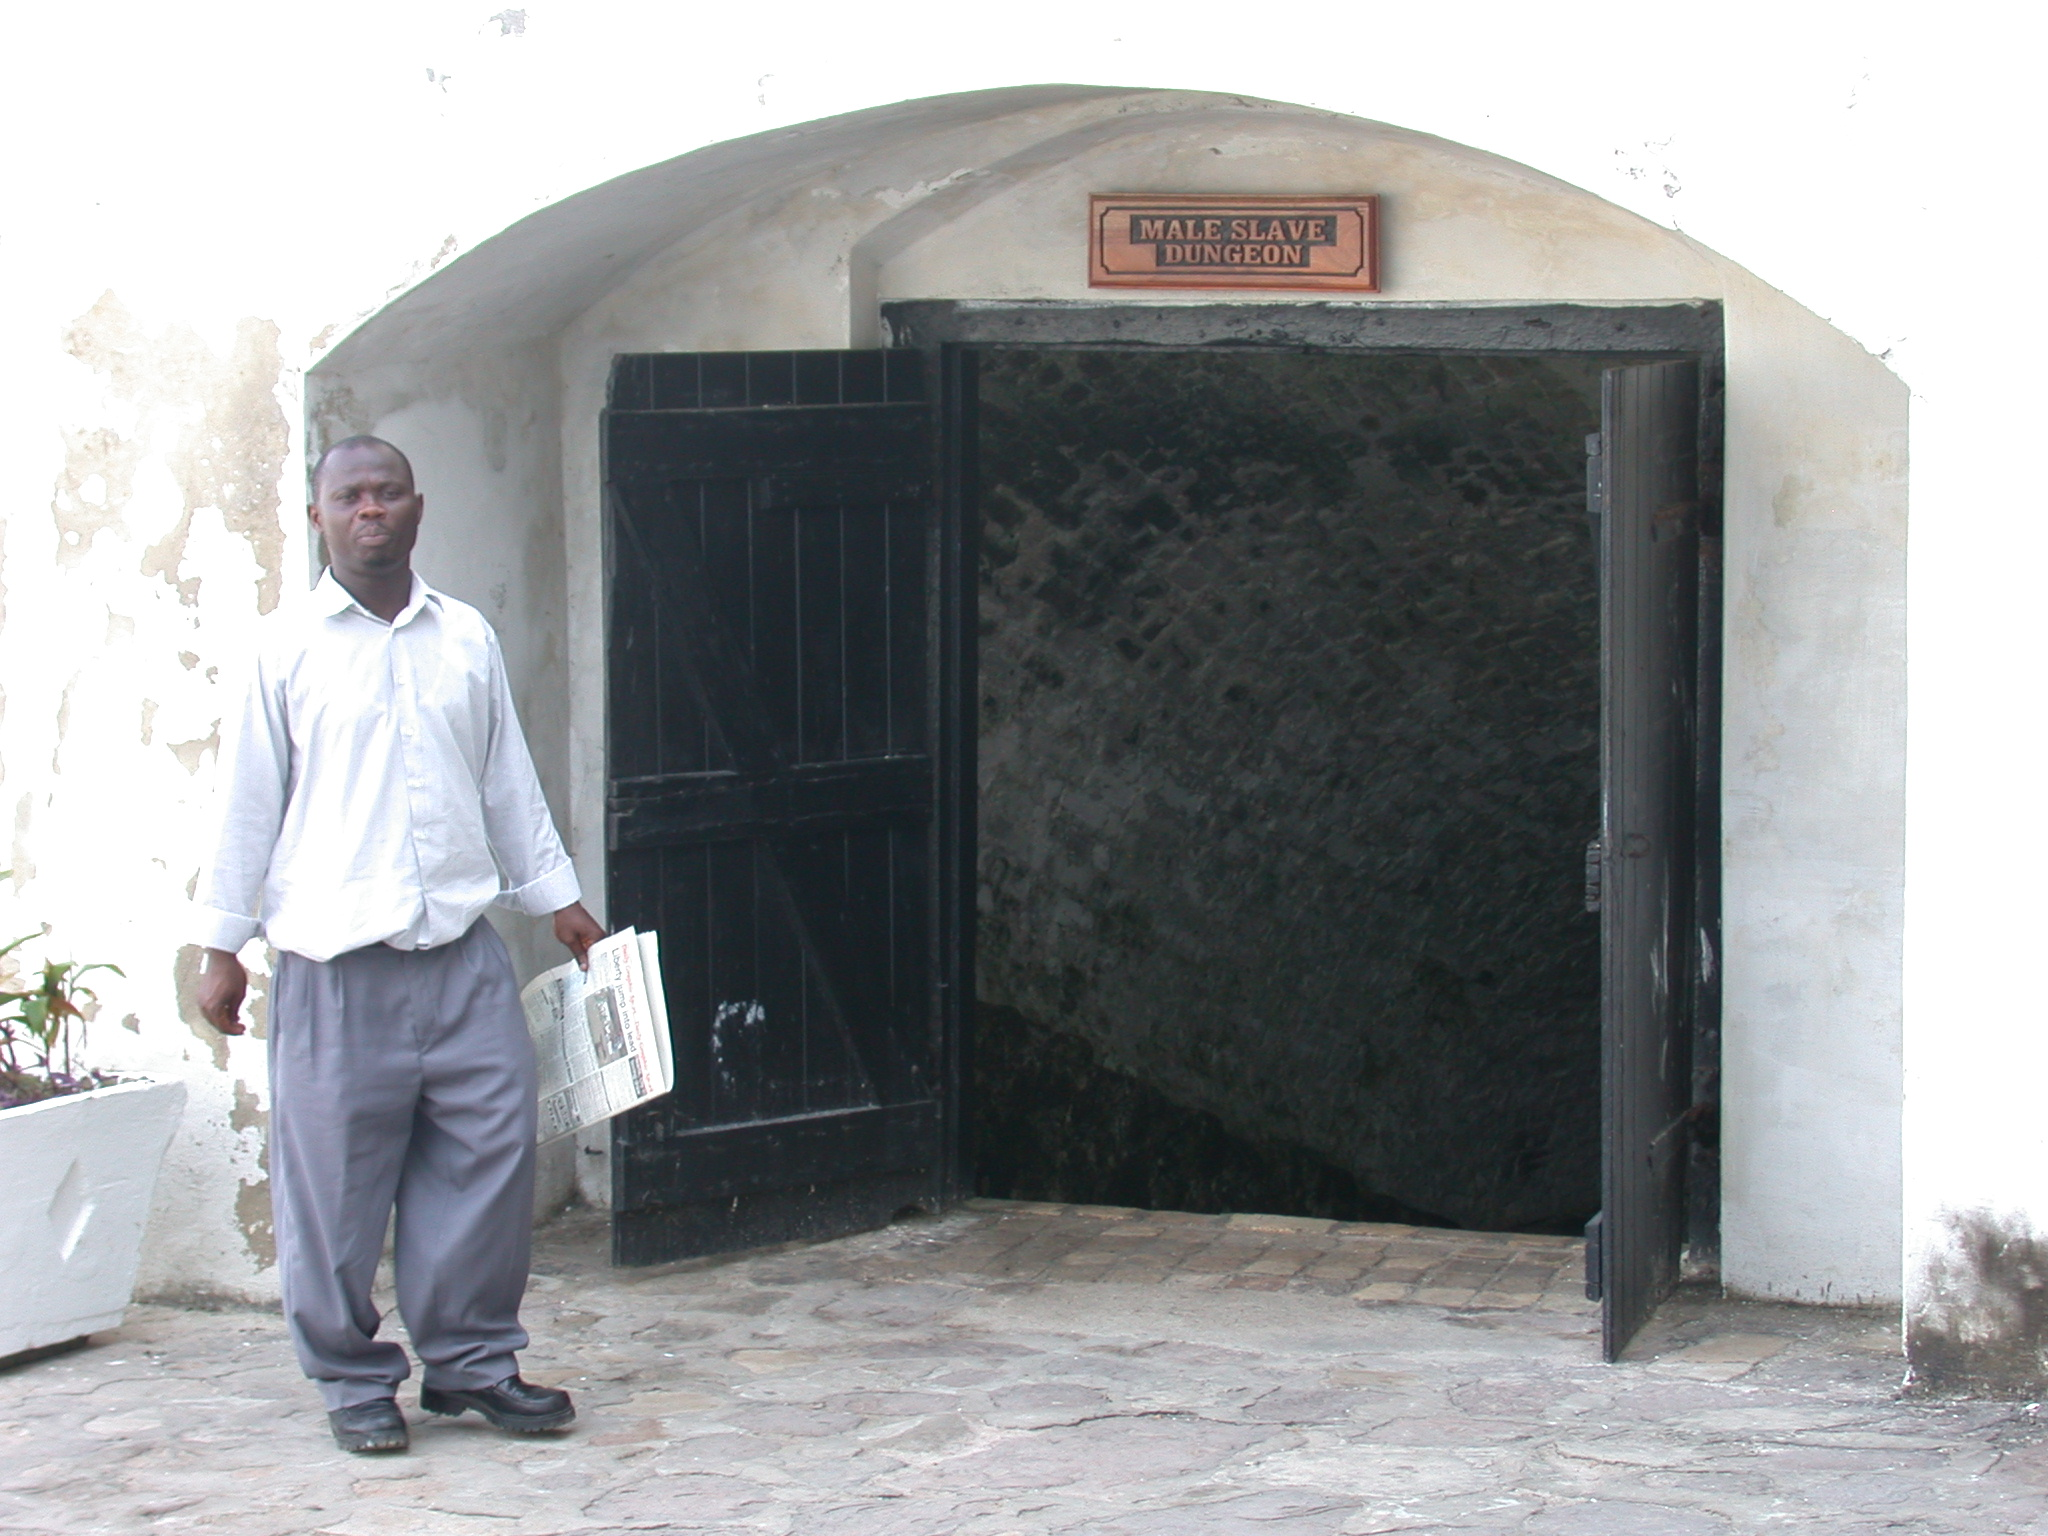 Entrance to Male Slave Dungeon, Cape Coast Slave Fort, Cape Coast, Ghana